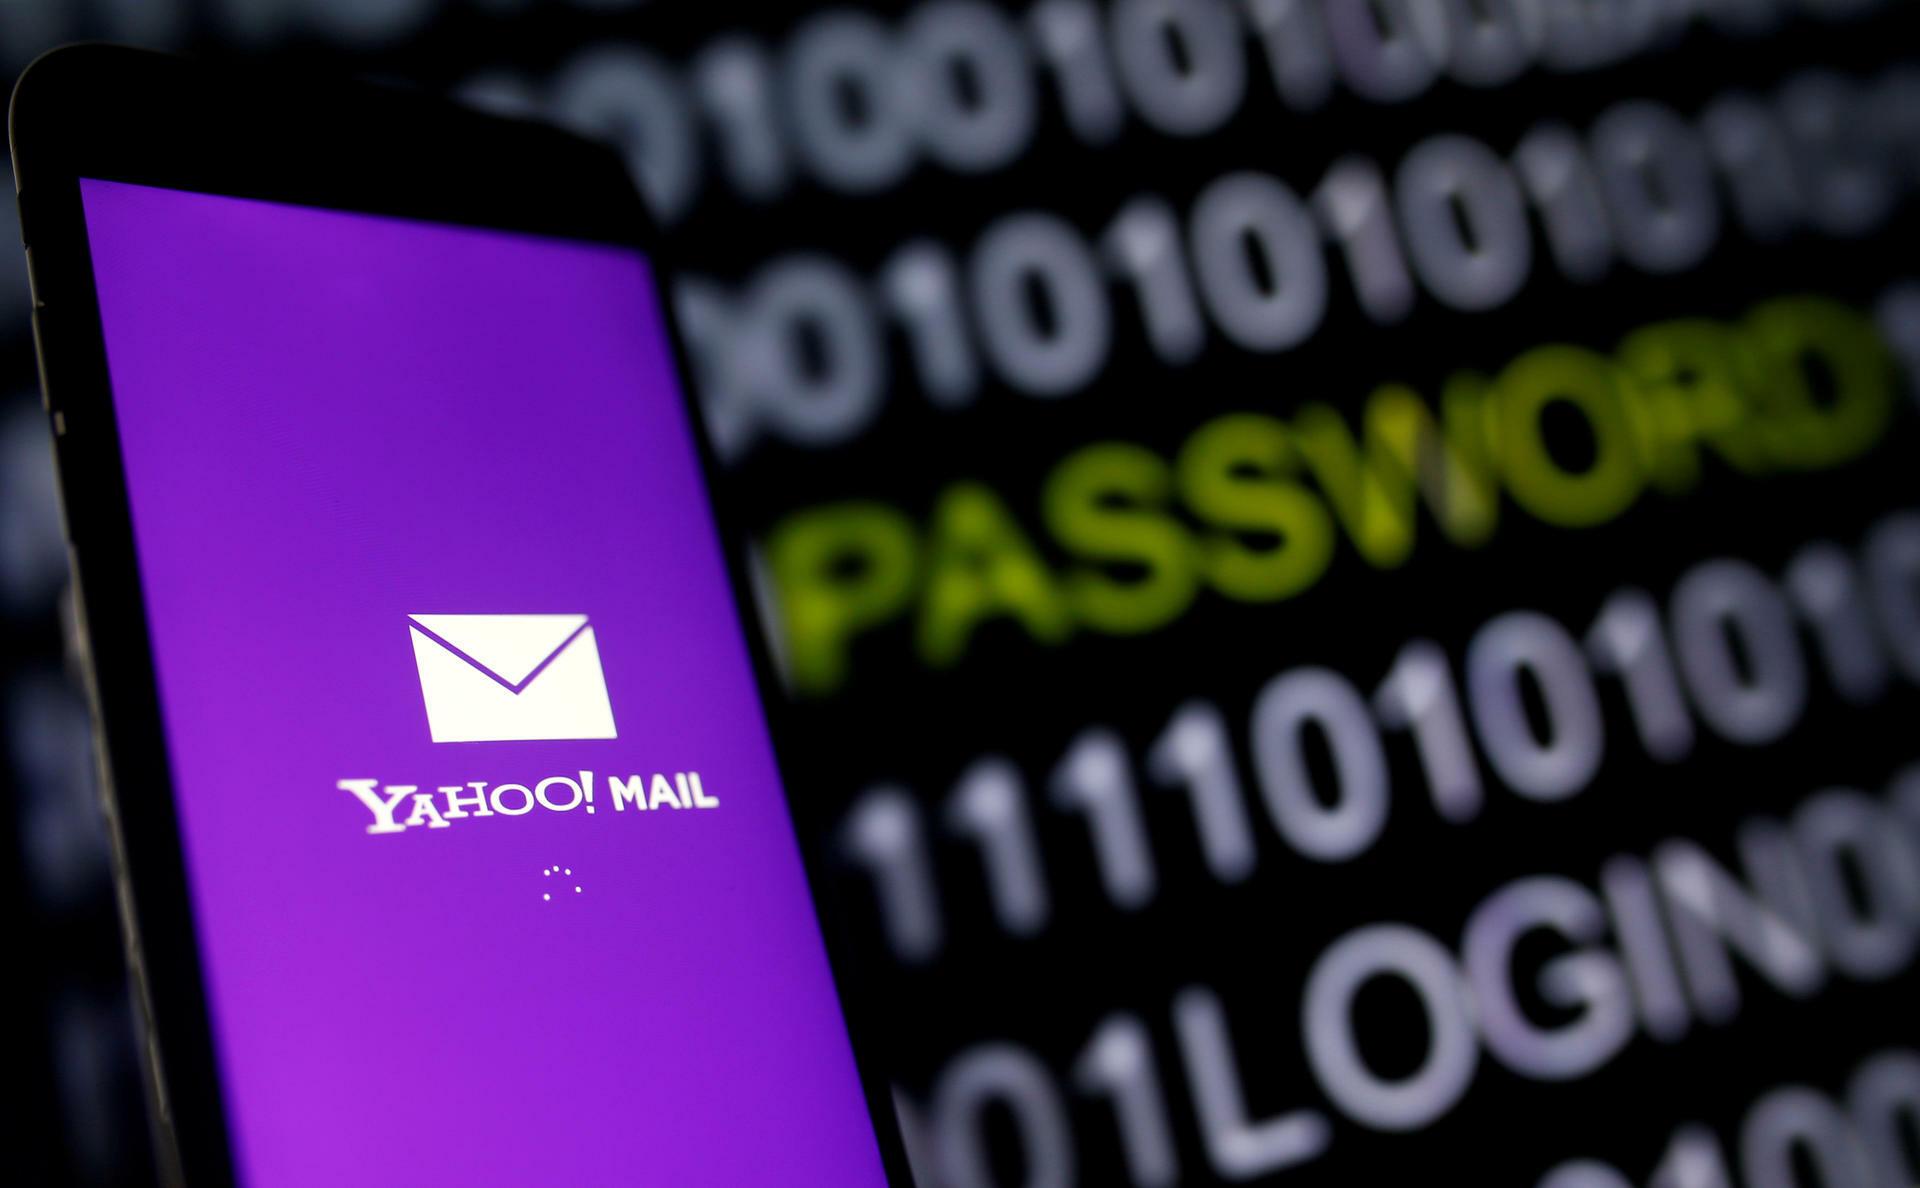 Yahoo: Hacker knackten 2013 drei Milliarden Konten